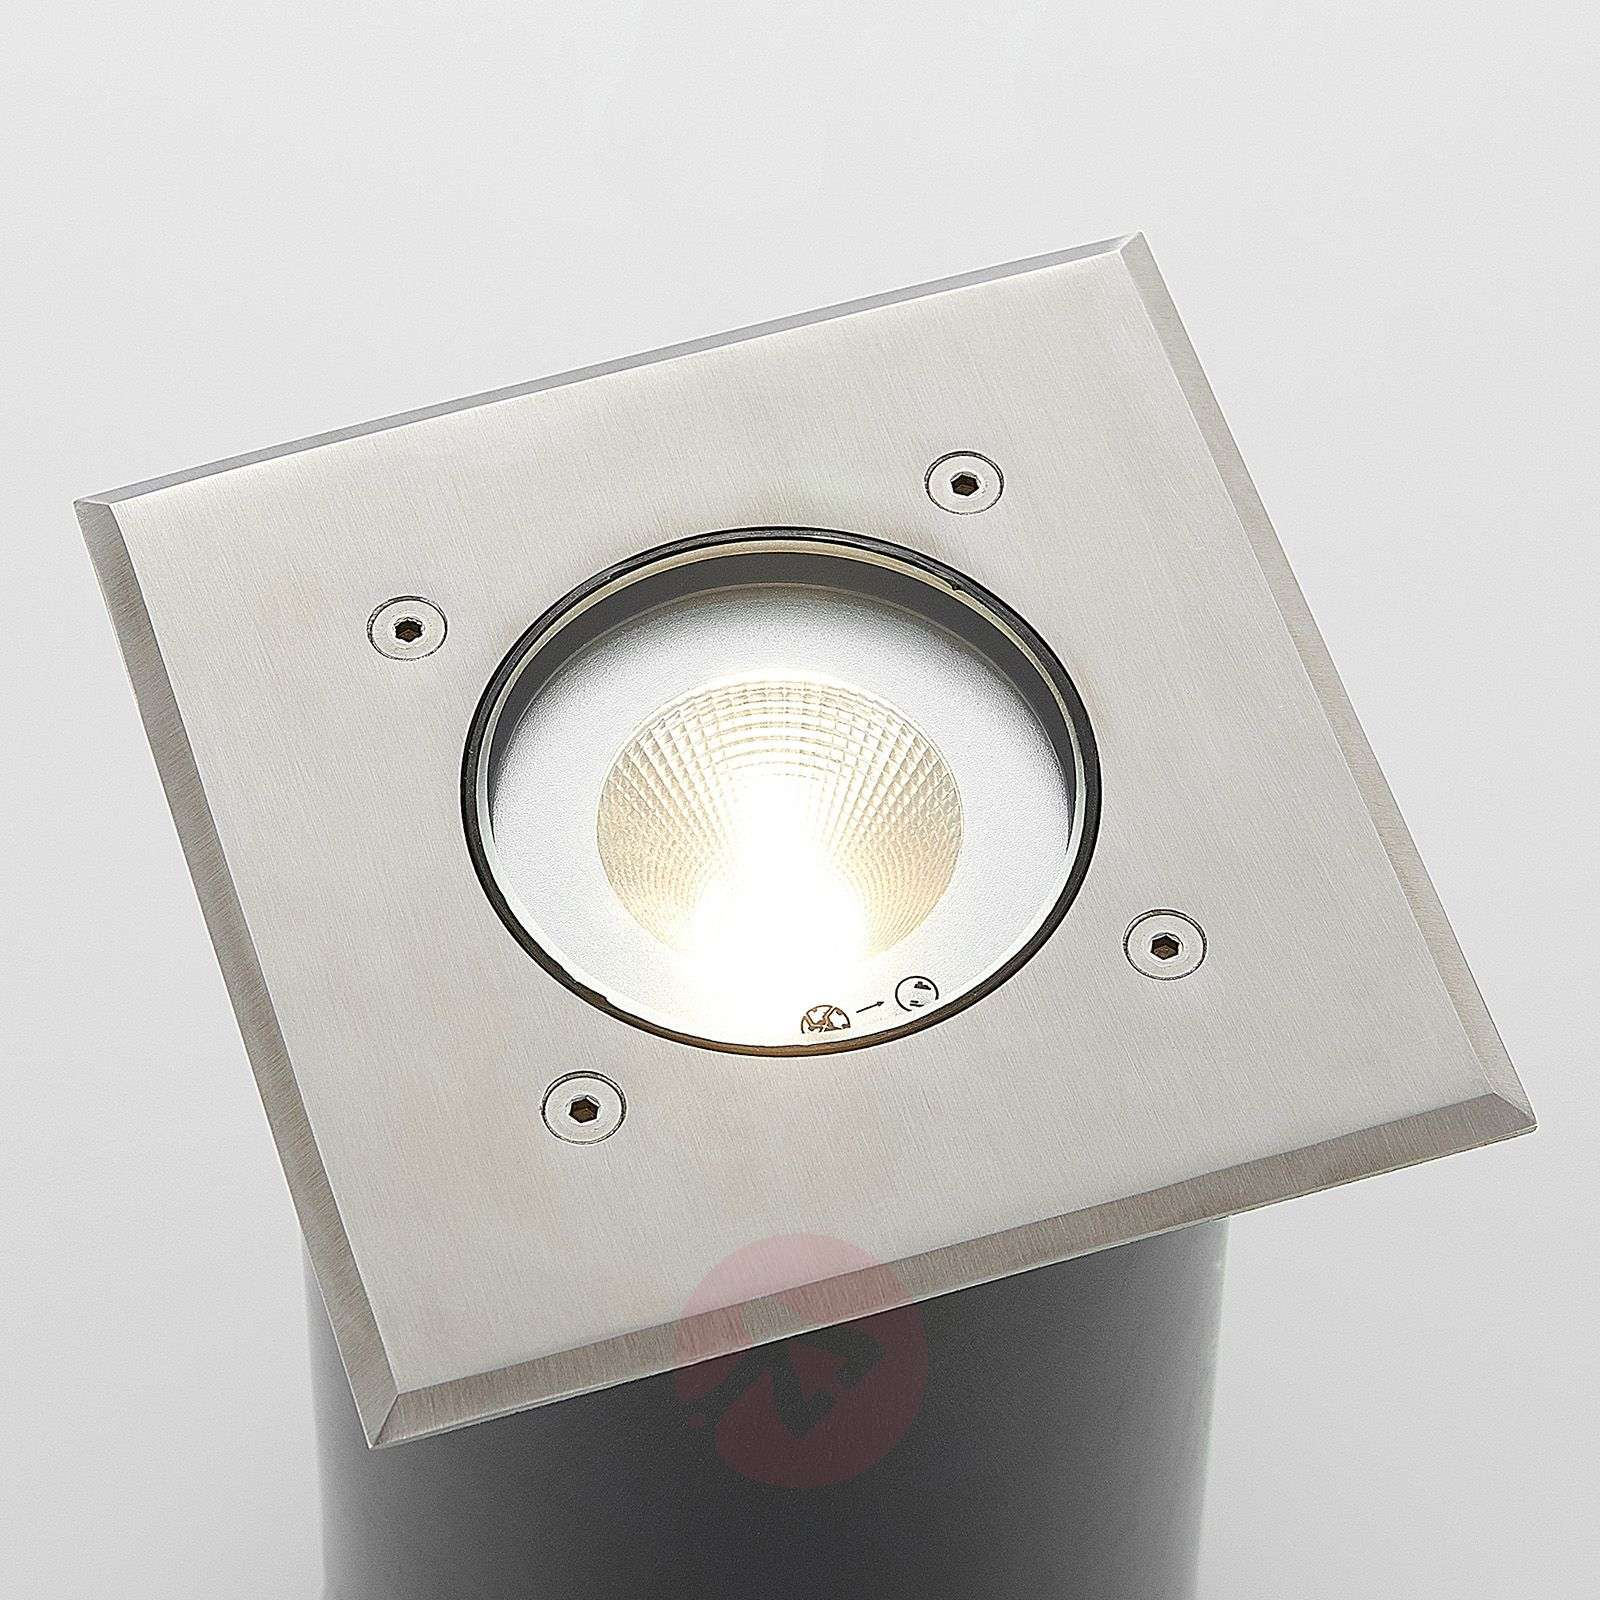 LED-lattiauppovalaisin Kari, kulmikas-9969084-02